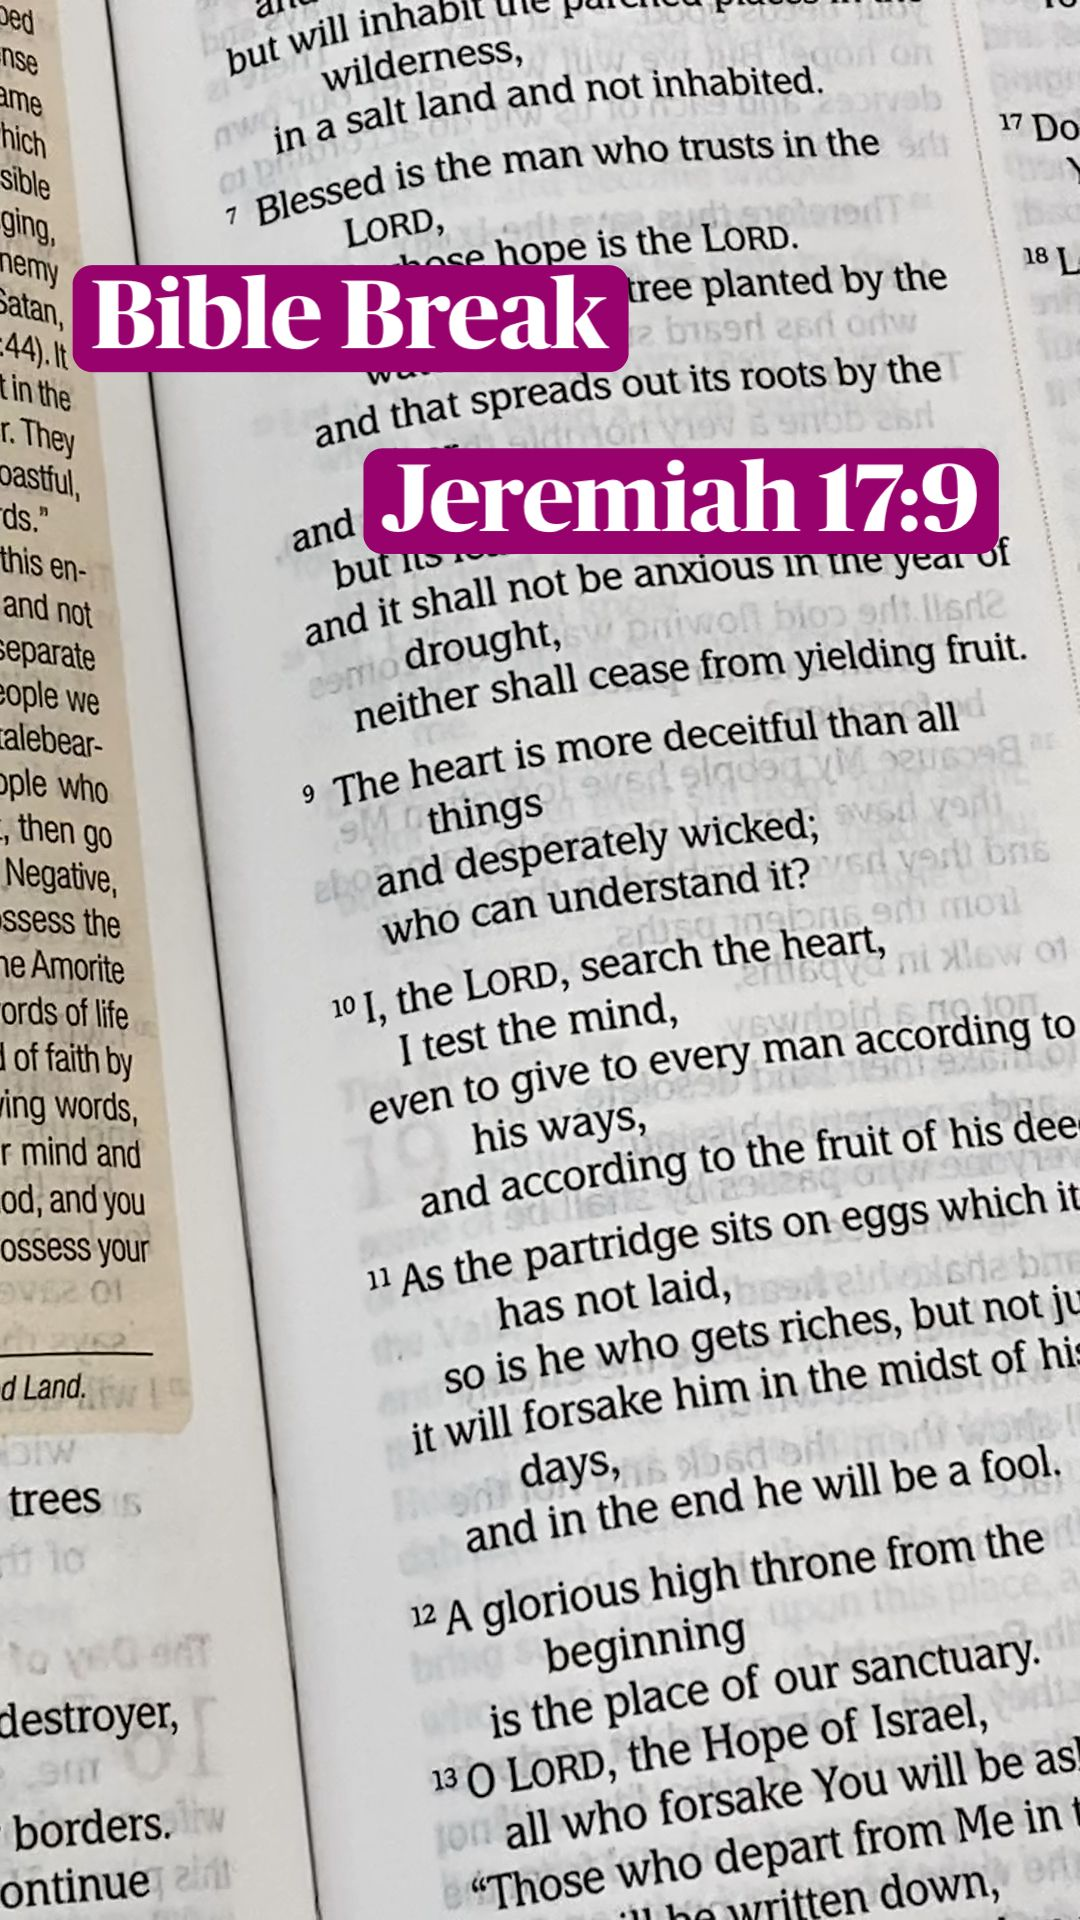 Bible Break